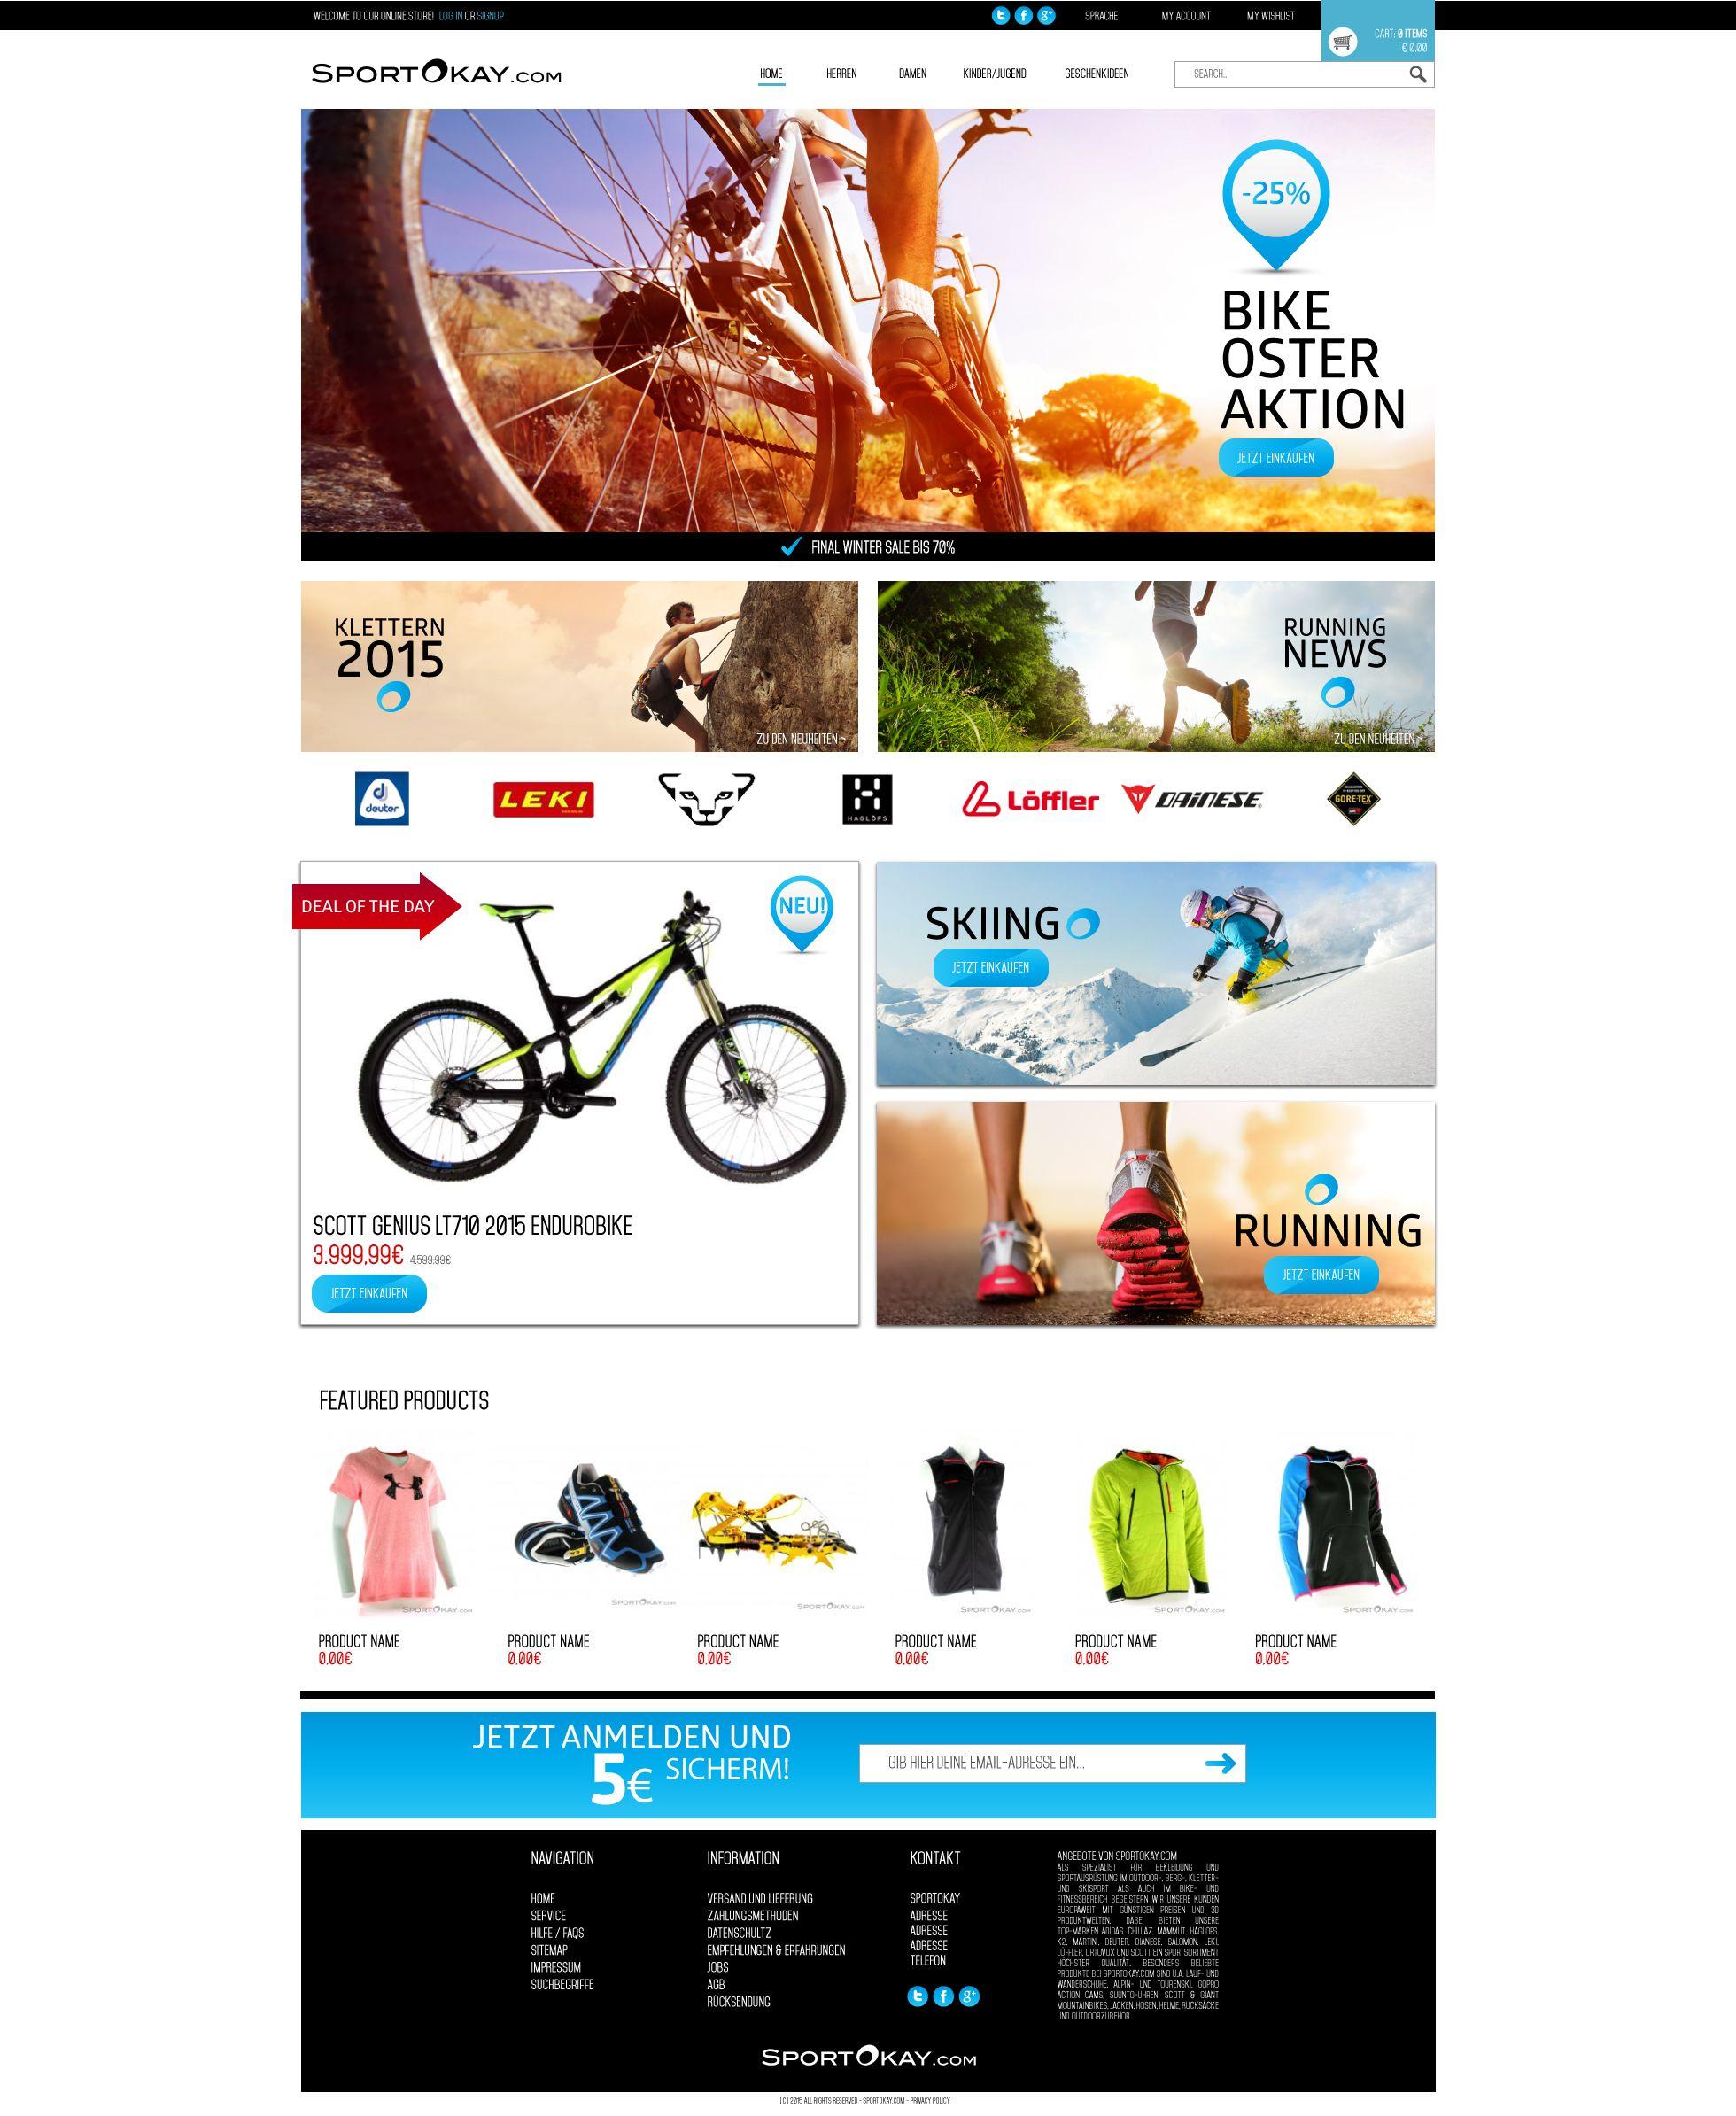 e commerce sports sports websiteweb design projectsideas - Web Design Project Ideas